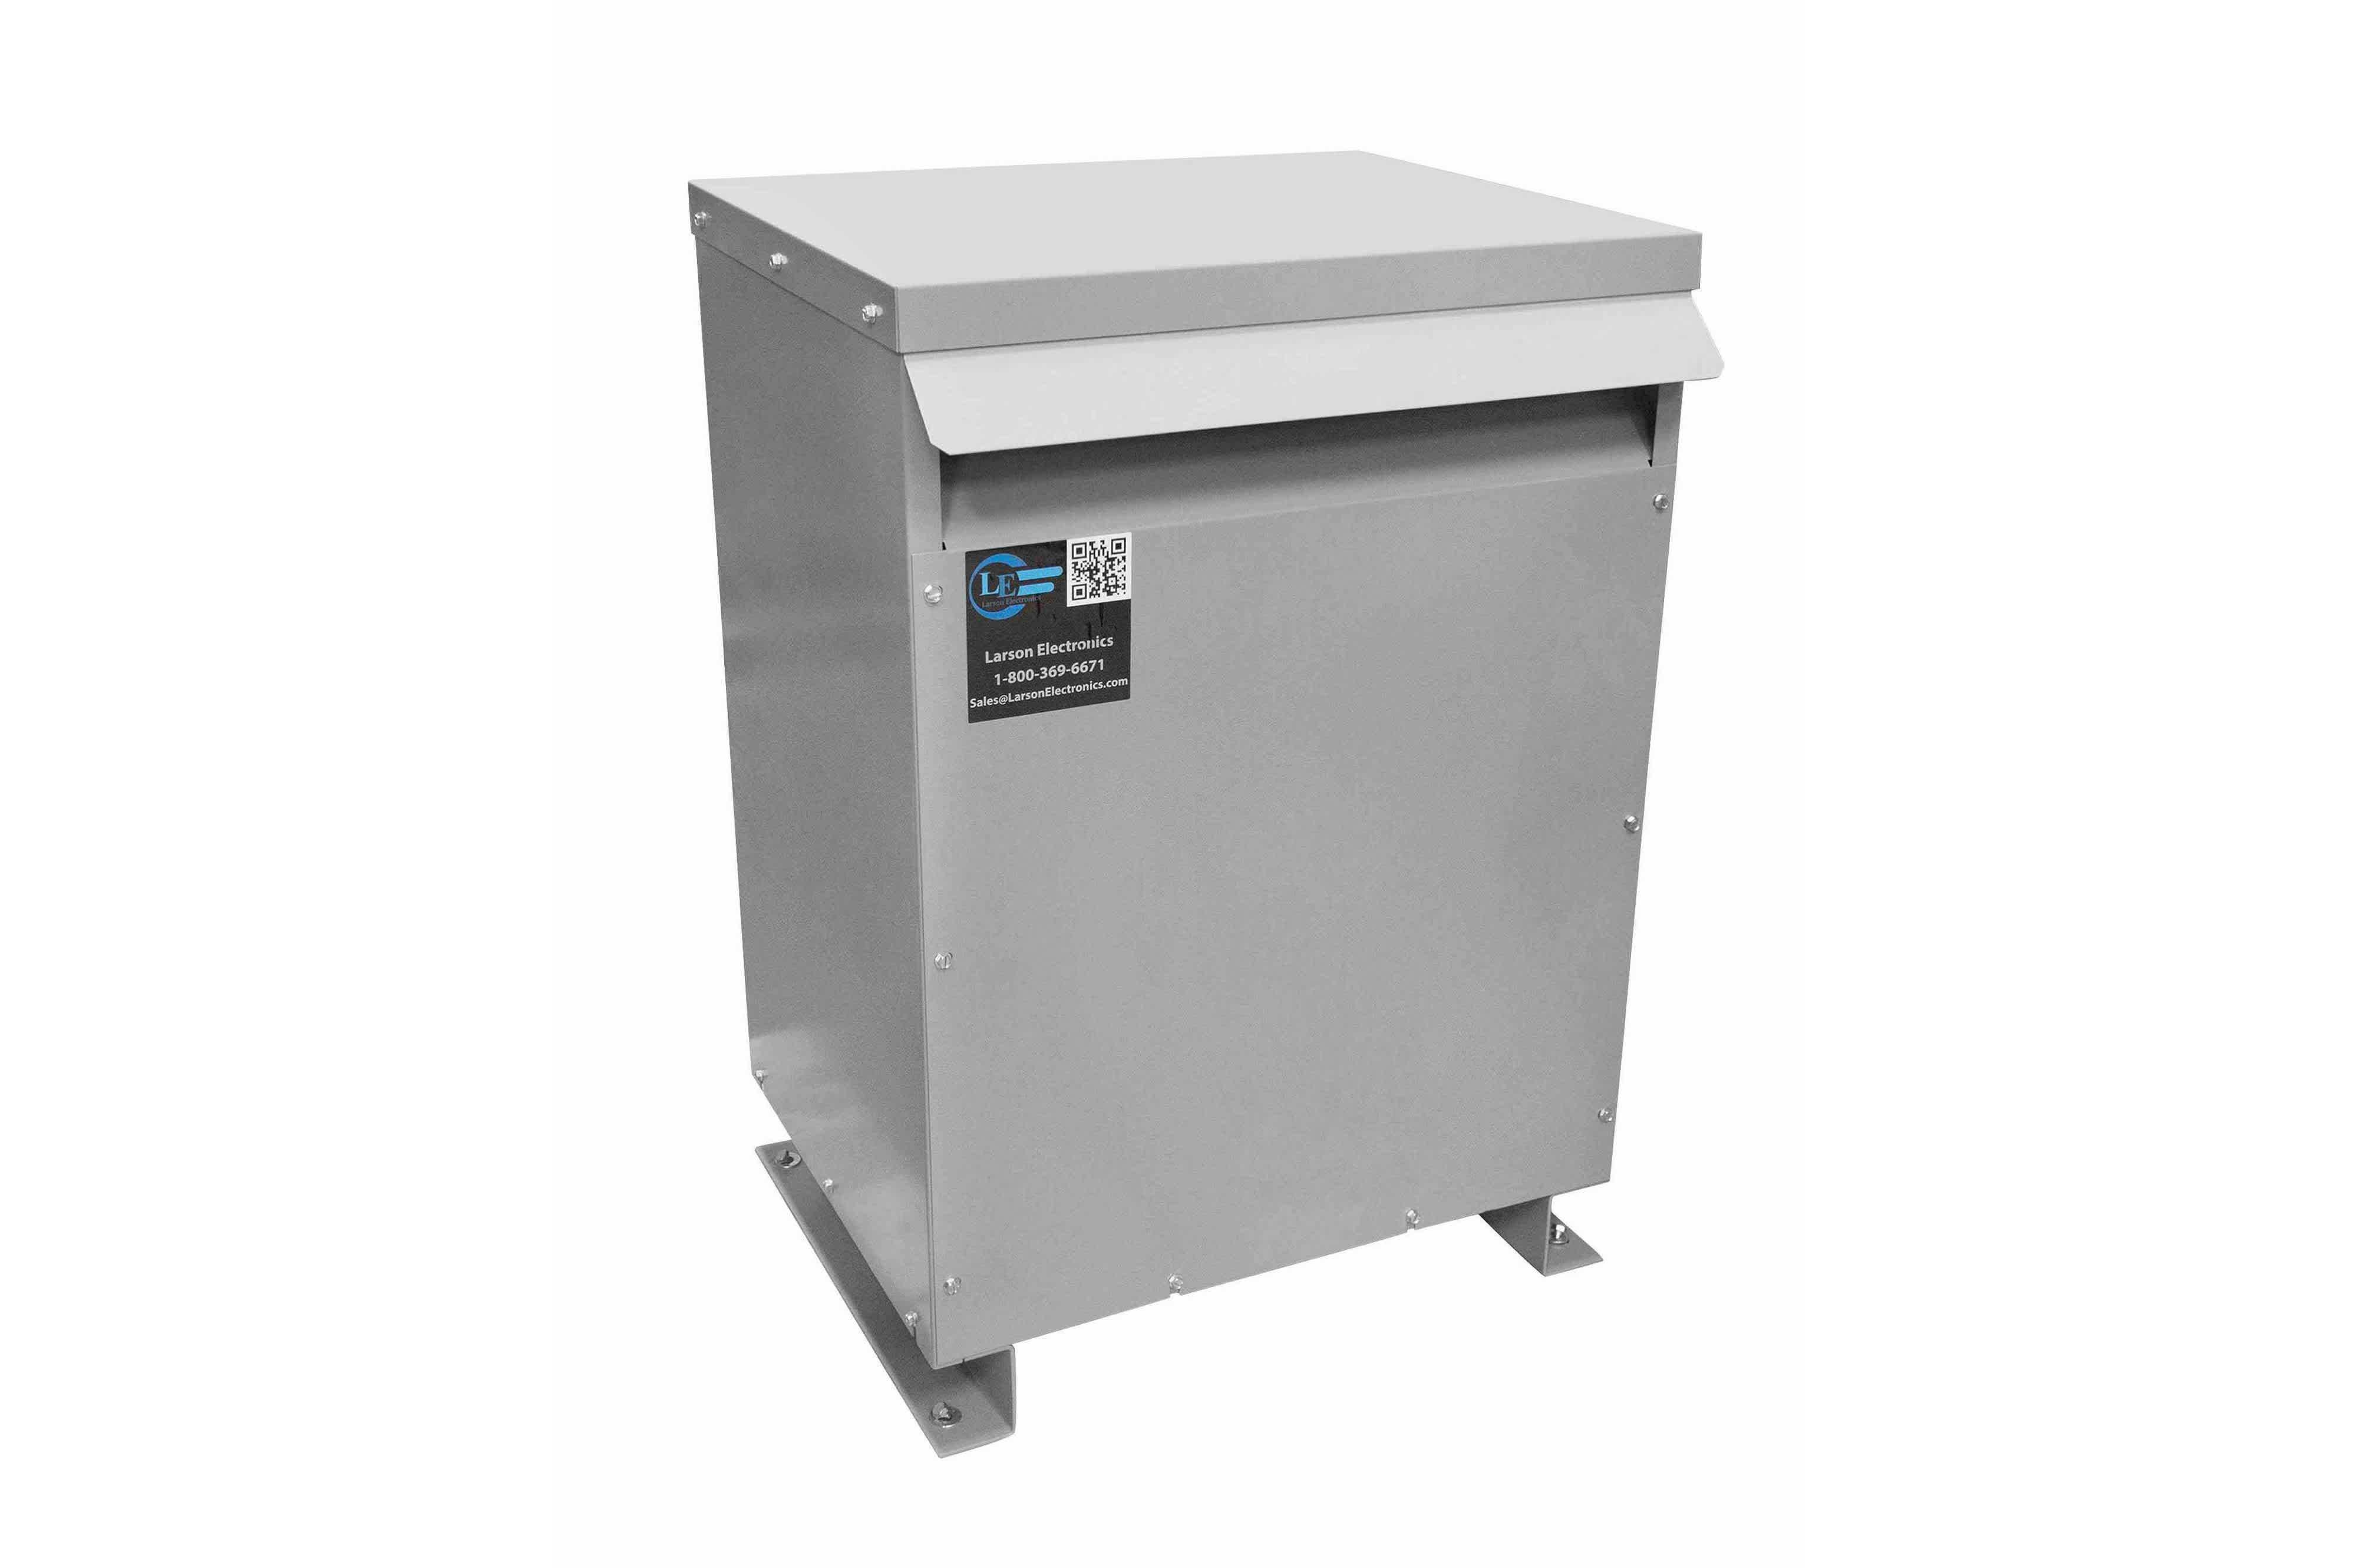 600 kVA 3PH Isolation Transformer, 380V Wye Primary, 240V/120 Delta Secondary, N3R, Ventilated, 60 Hz